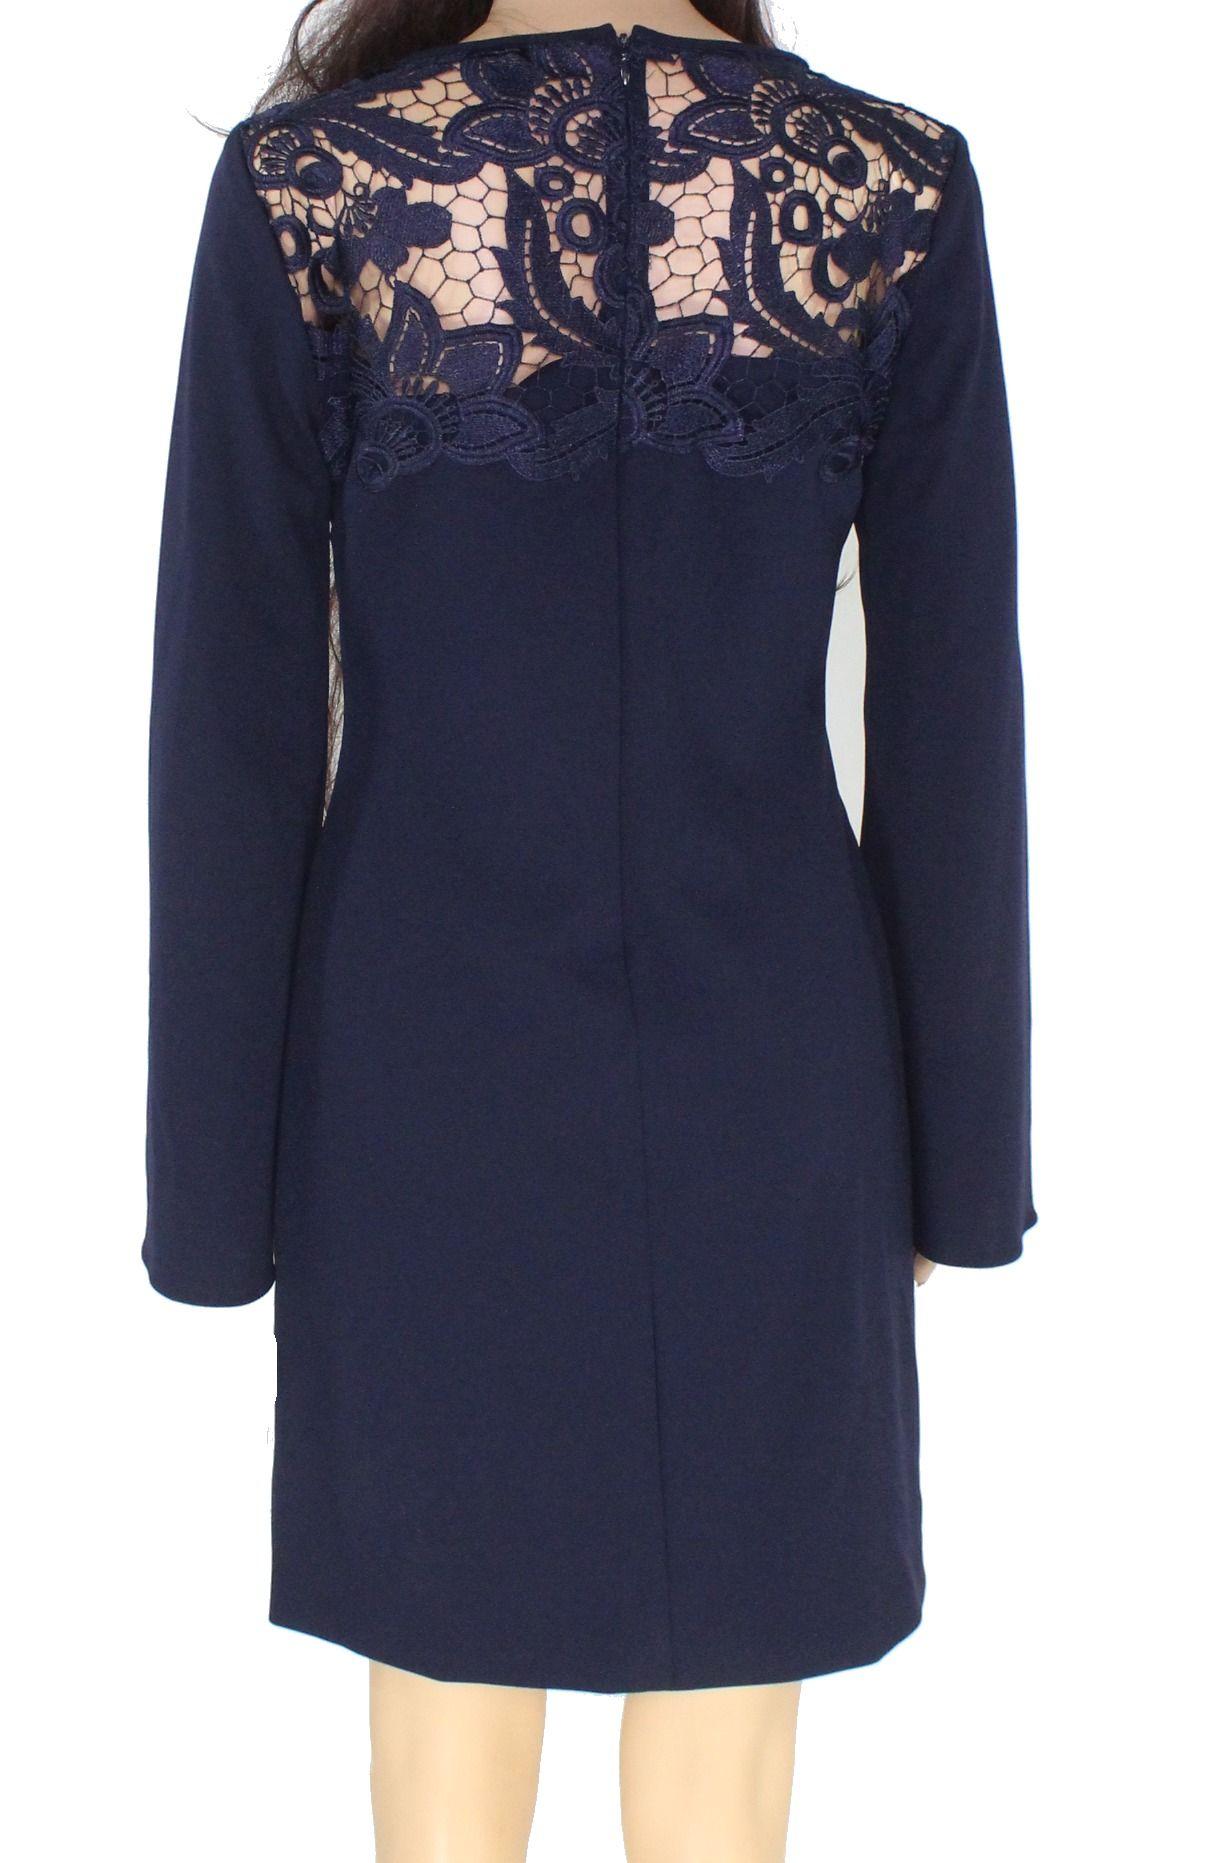 Lauren by Ralph Lauren Women's Shift Dress Navy Blue Size 4 Lace